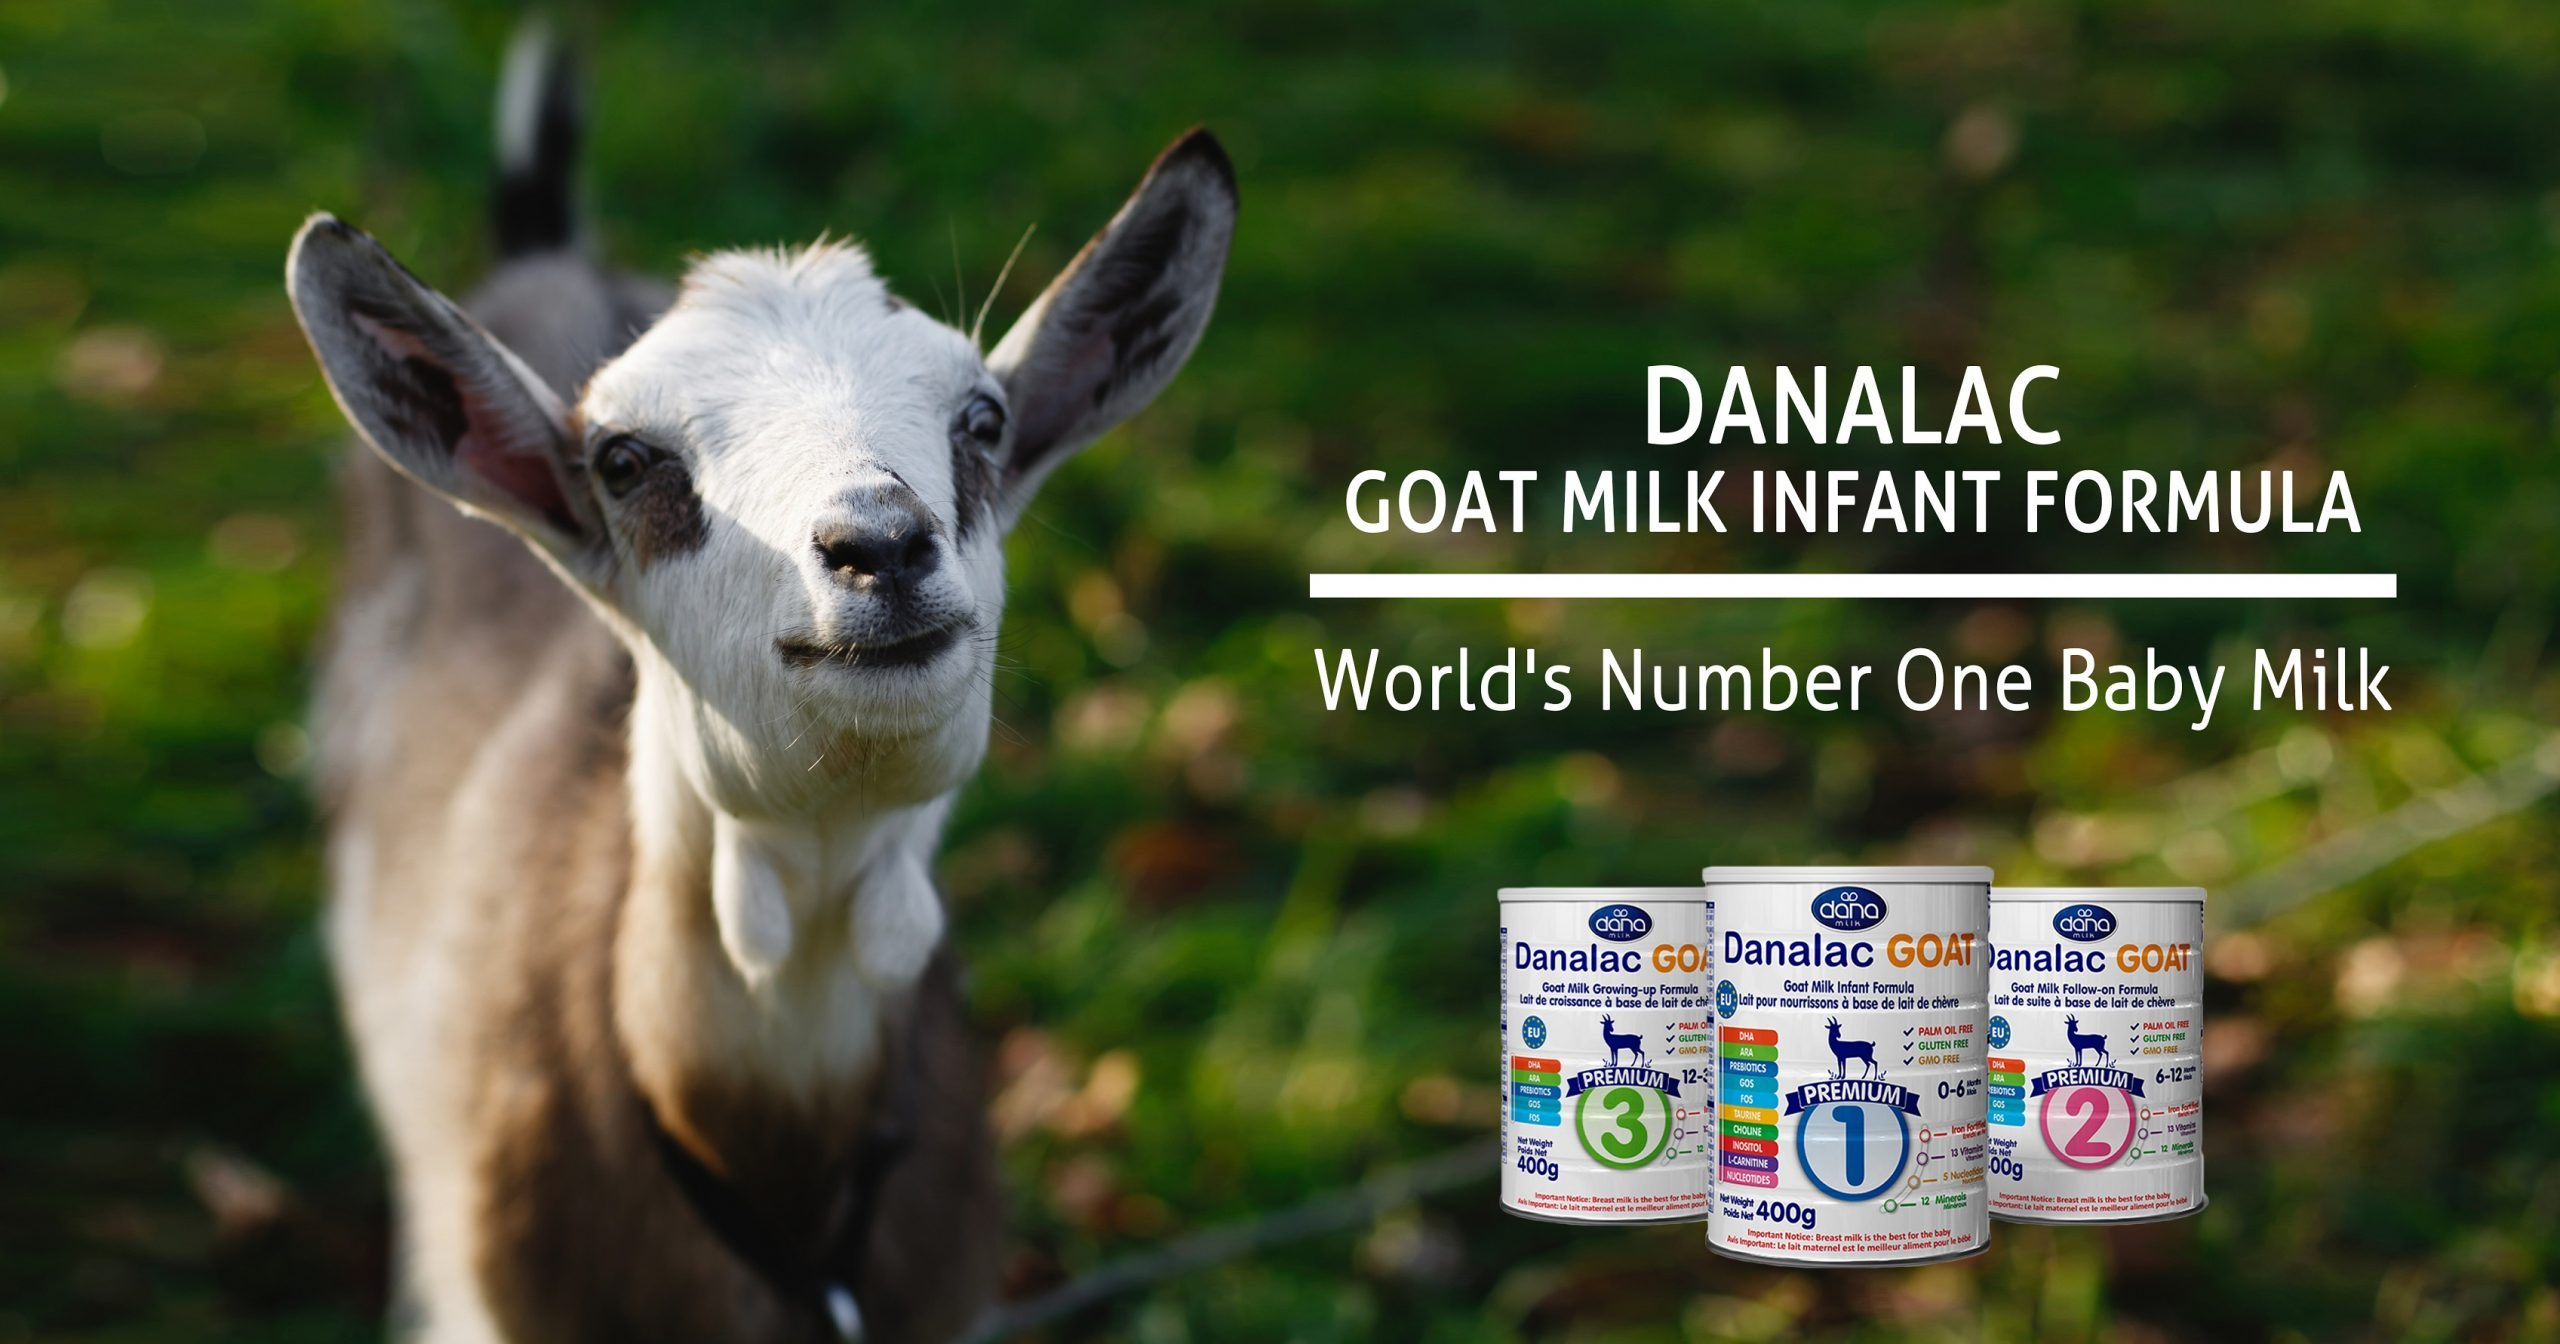 DANALAC Goat Milk infant formula - World Best Baby Milk